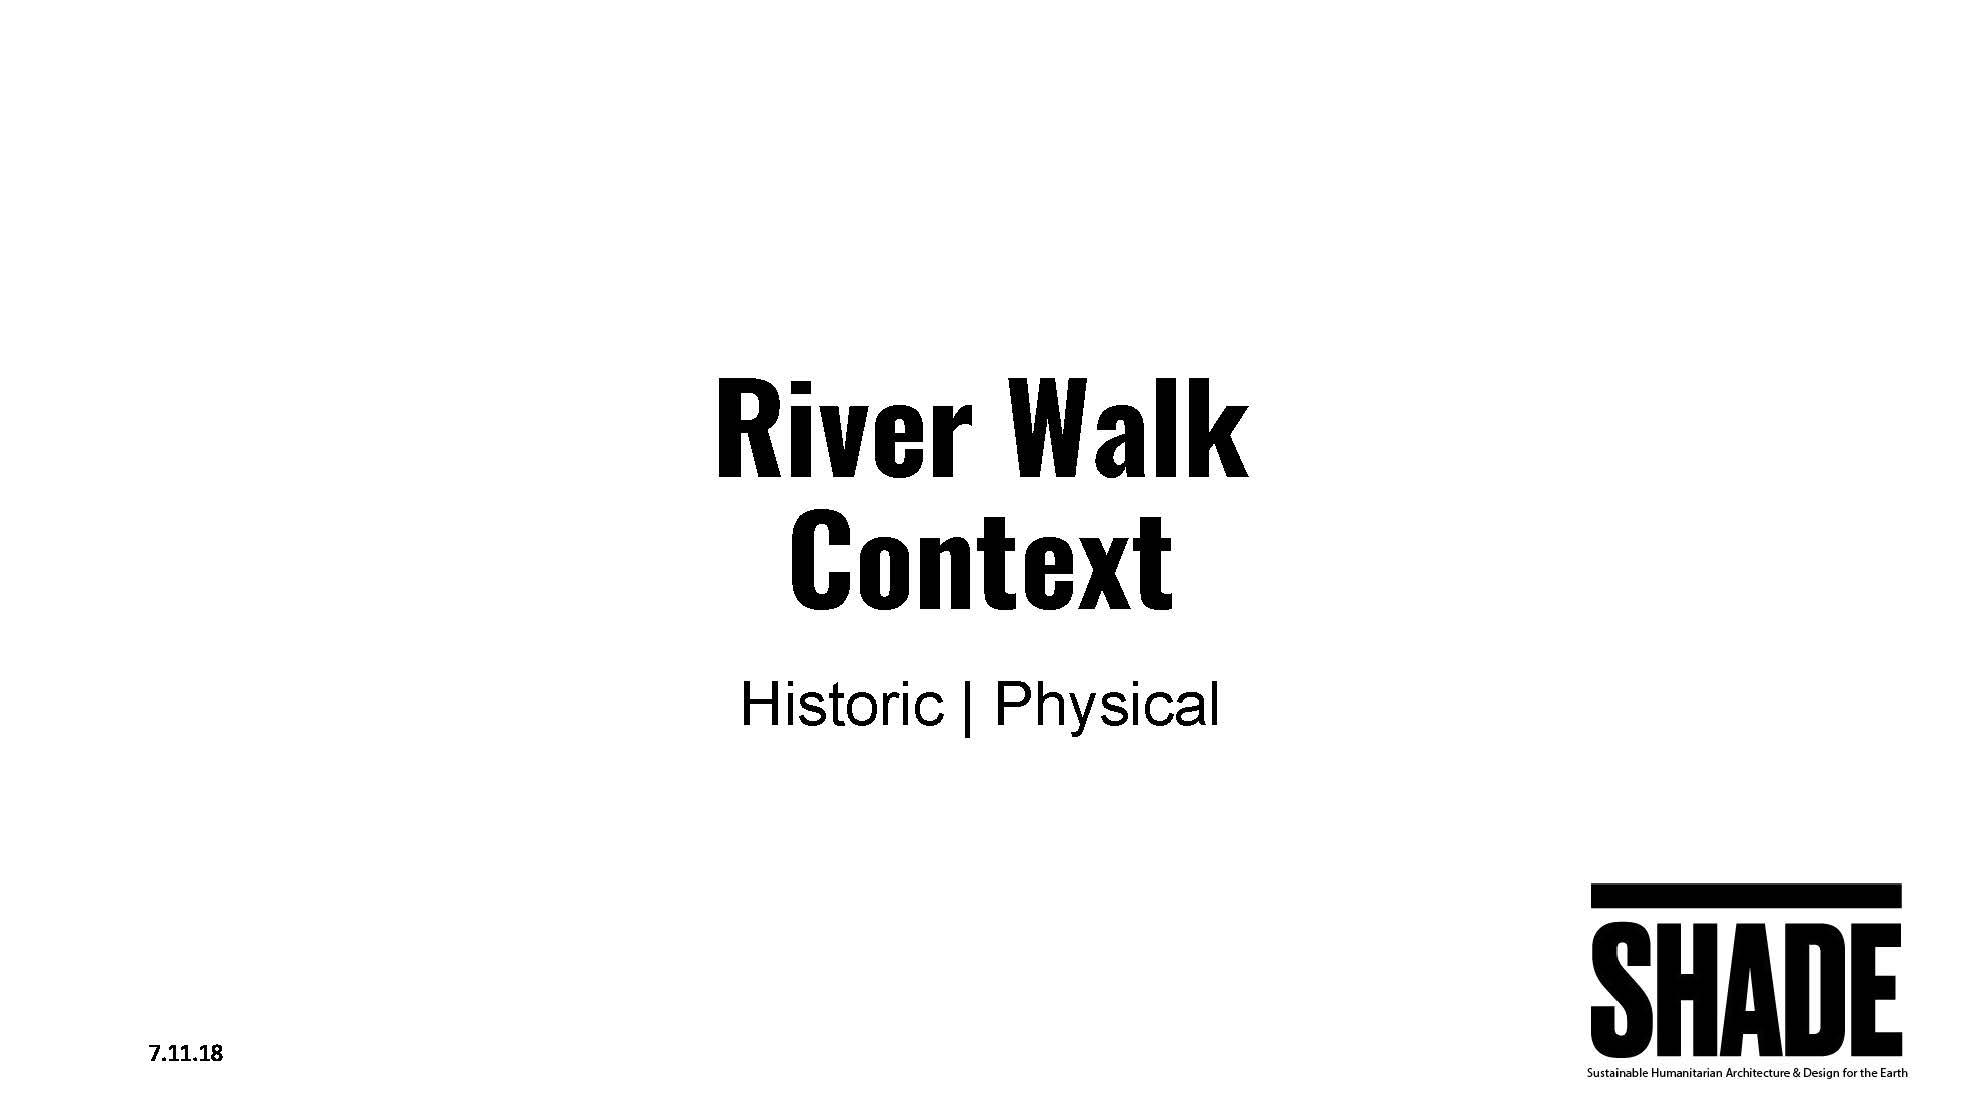 River Walk CDW 7.11.18 (1)_Page_13.jpg